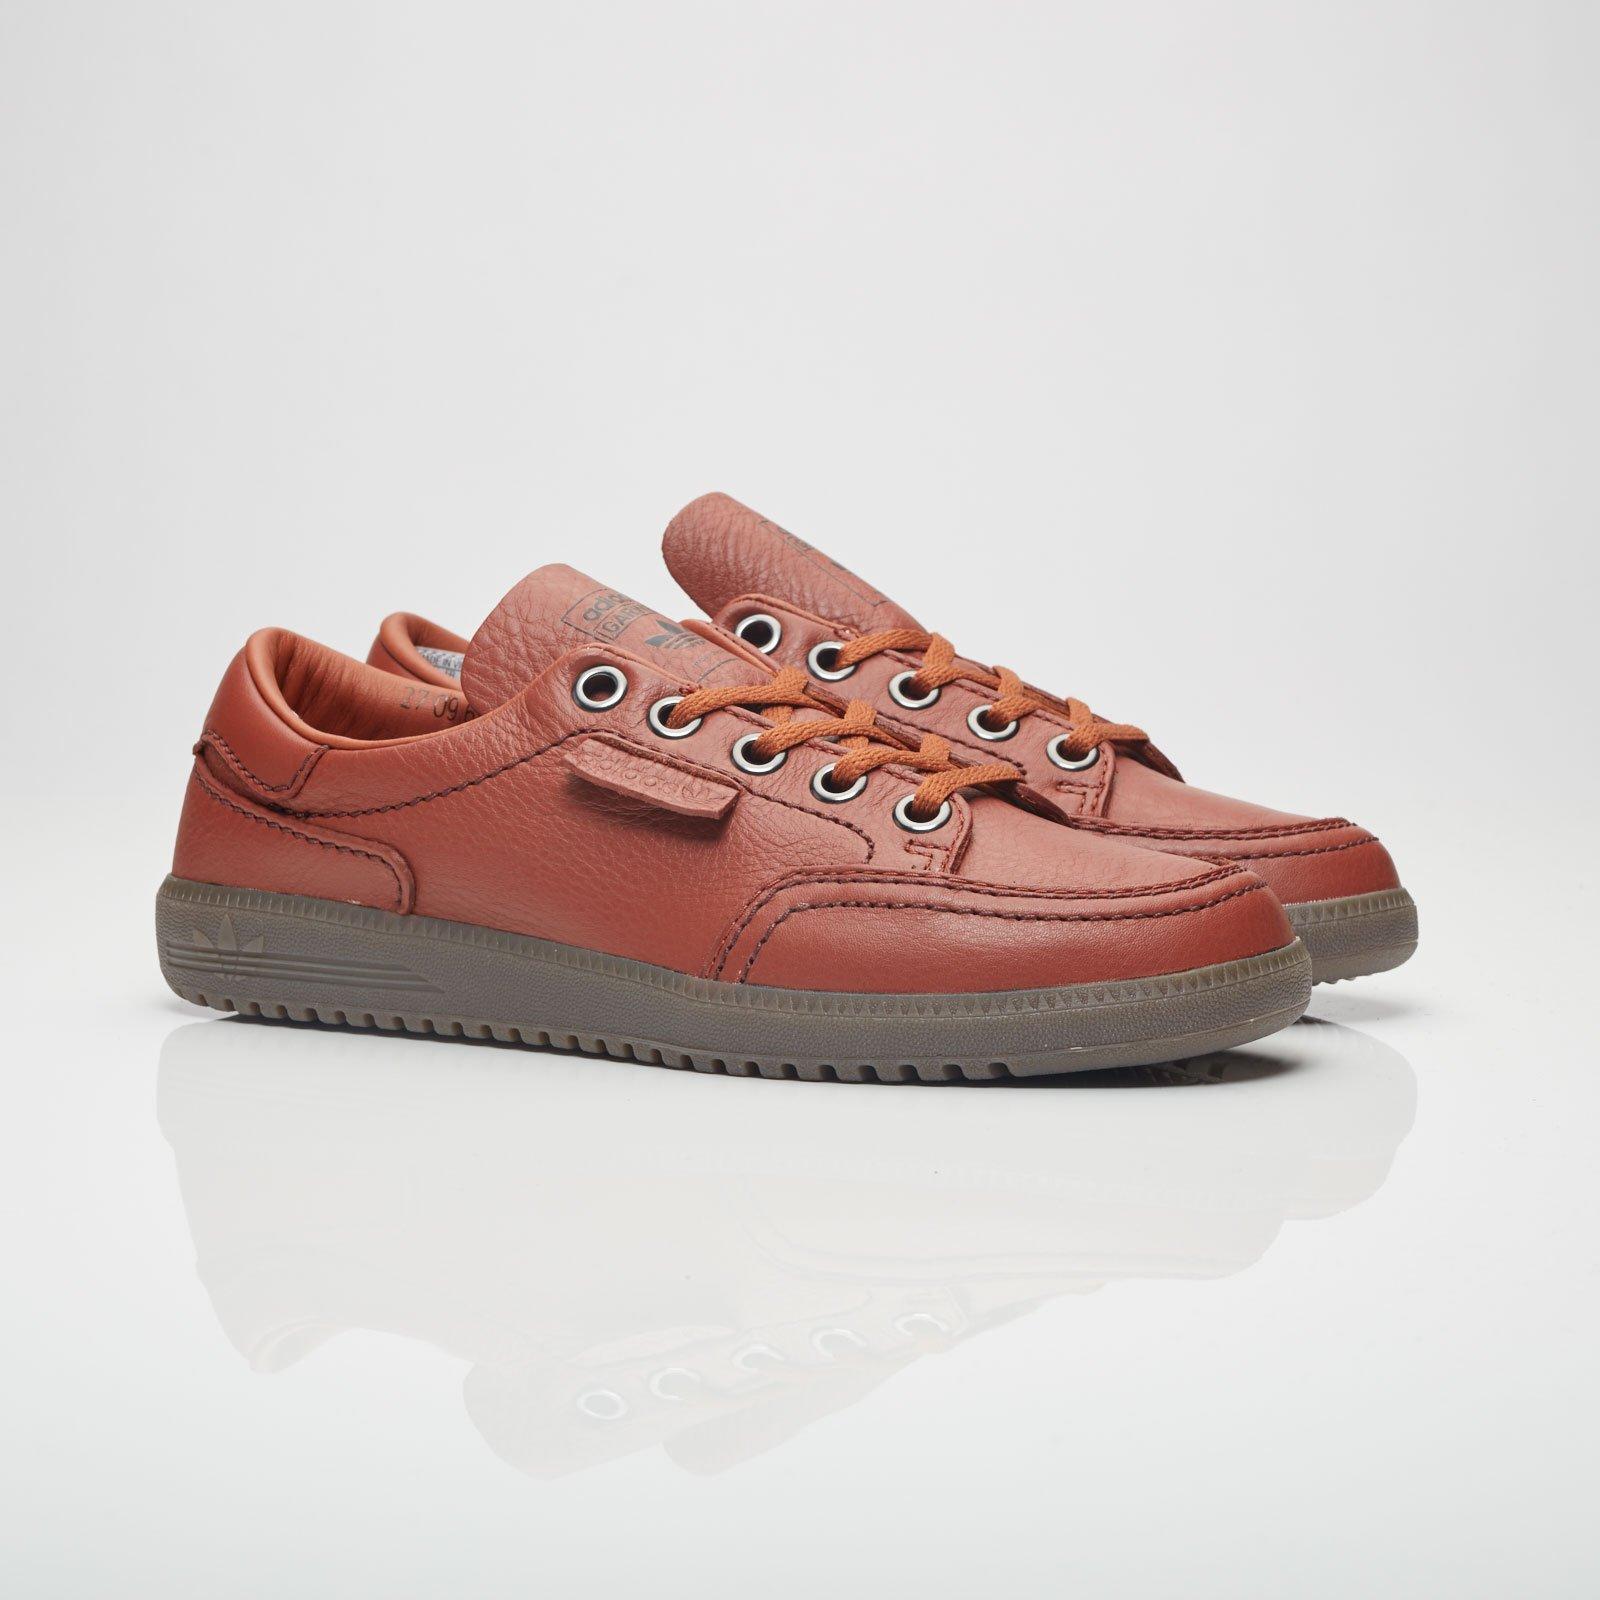 free shipping db08e cf8a3 adidas Garwen - Ba7723 - Sneakersnstuff | sneakers ...